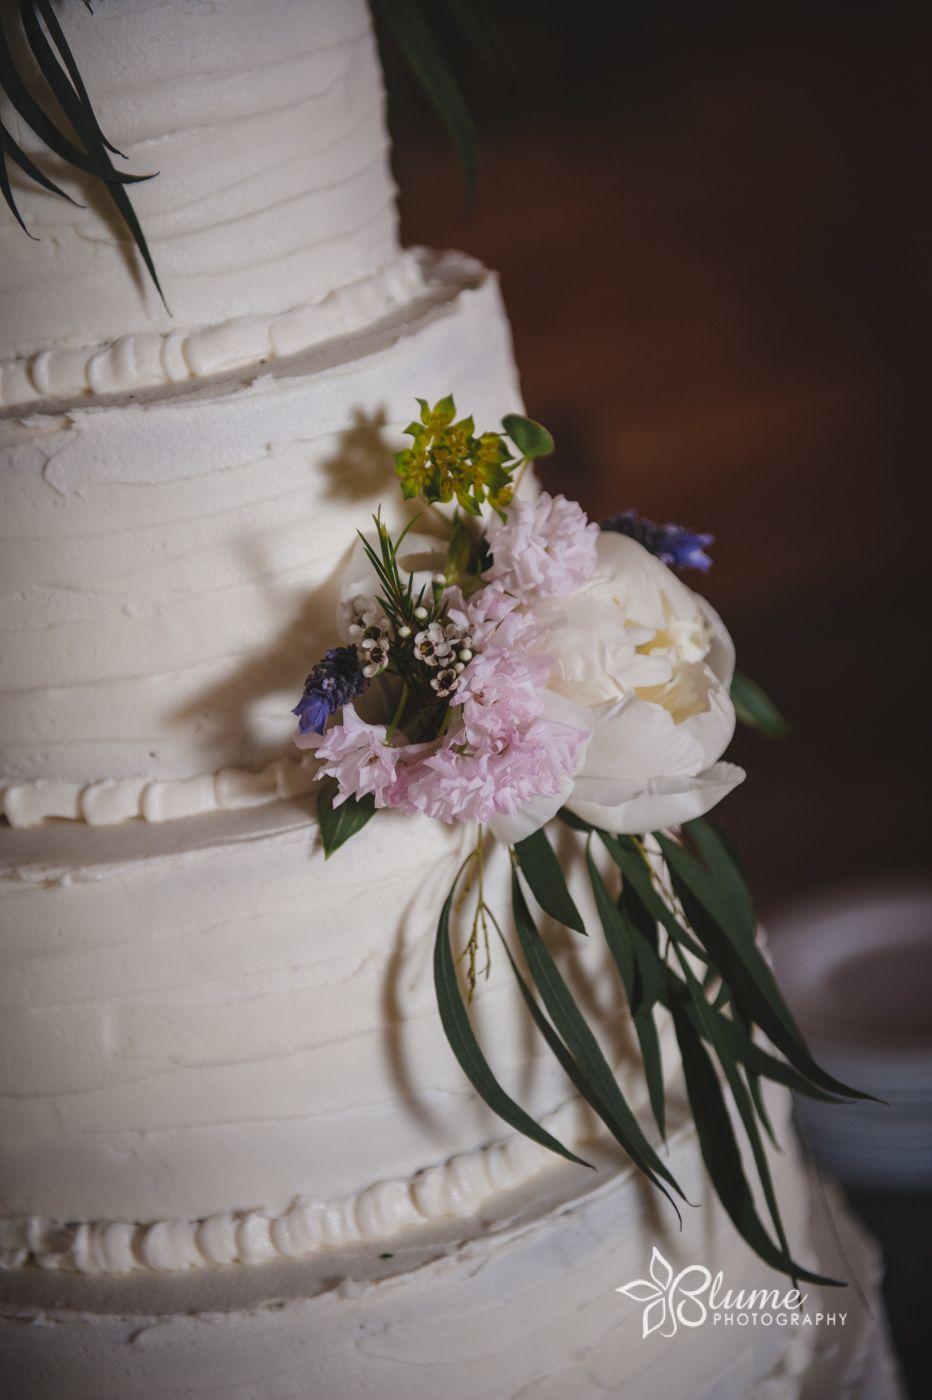 Cheney and bencake designs by debralake oconee ga wedding cake